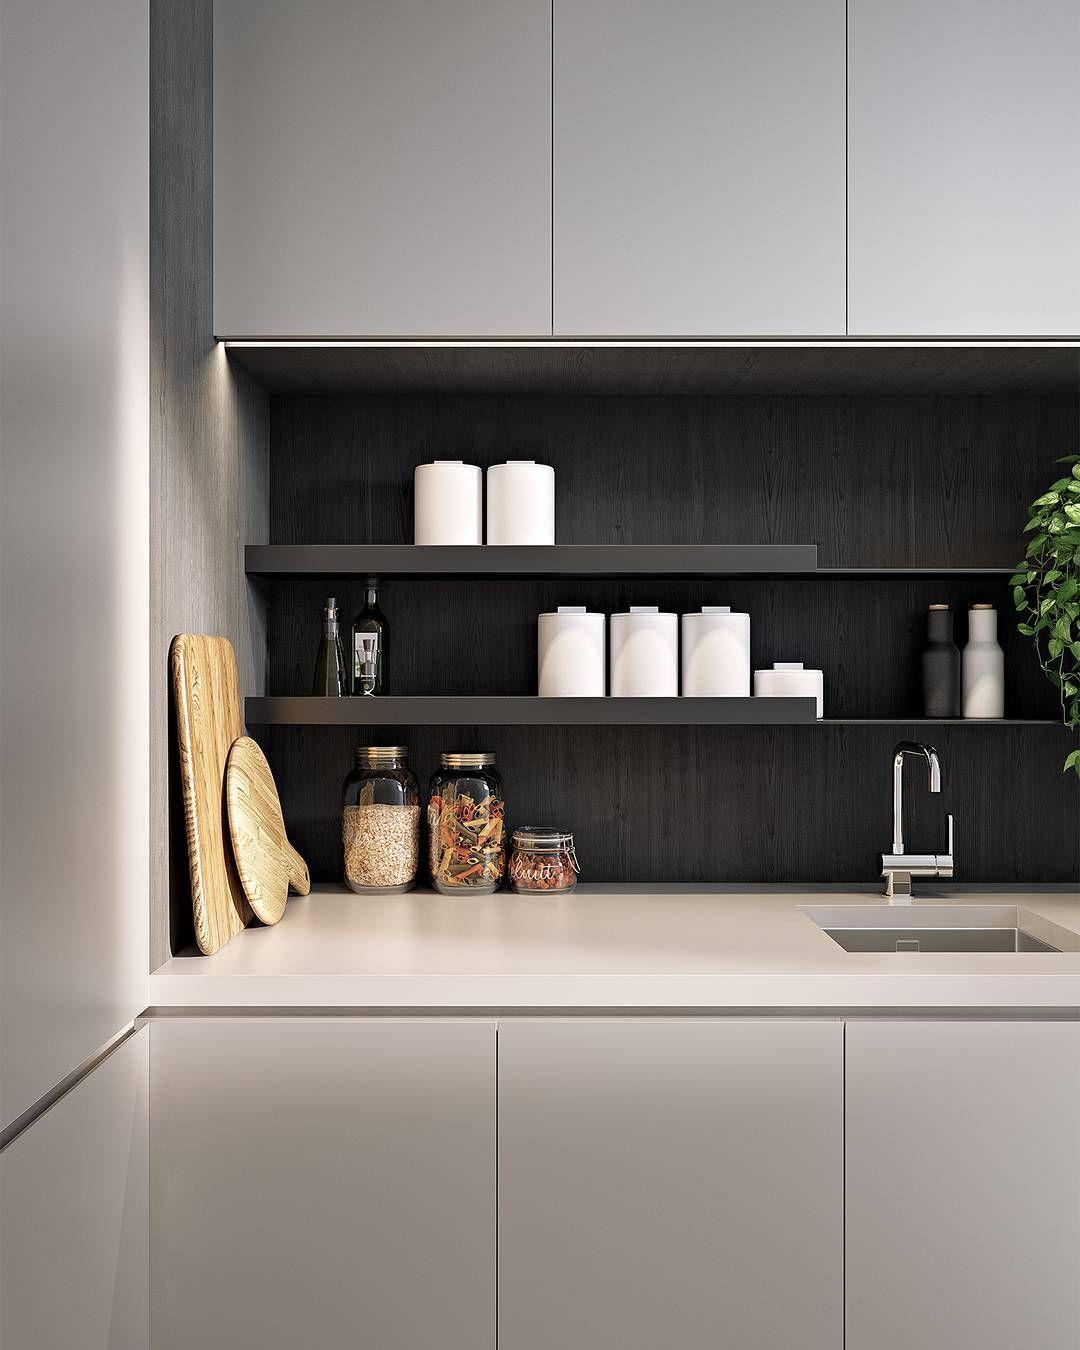 Kitchen Layout Design Tool: #kitchen Design Tool Ikea #very Small Kitchen Design